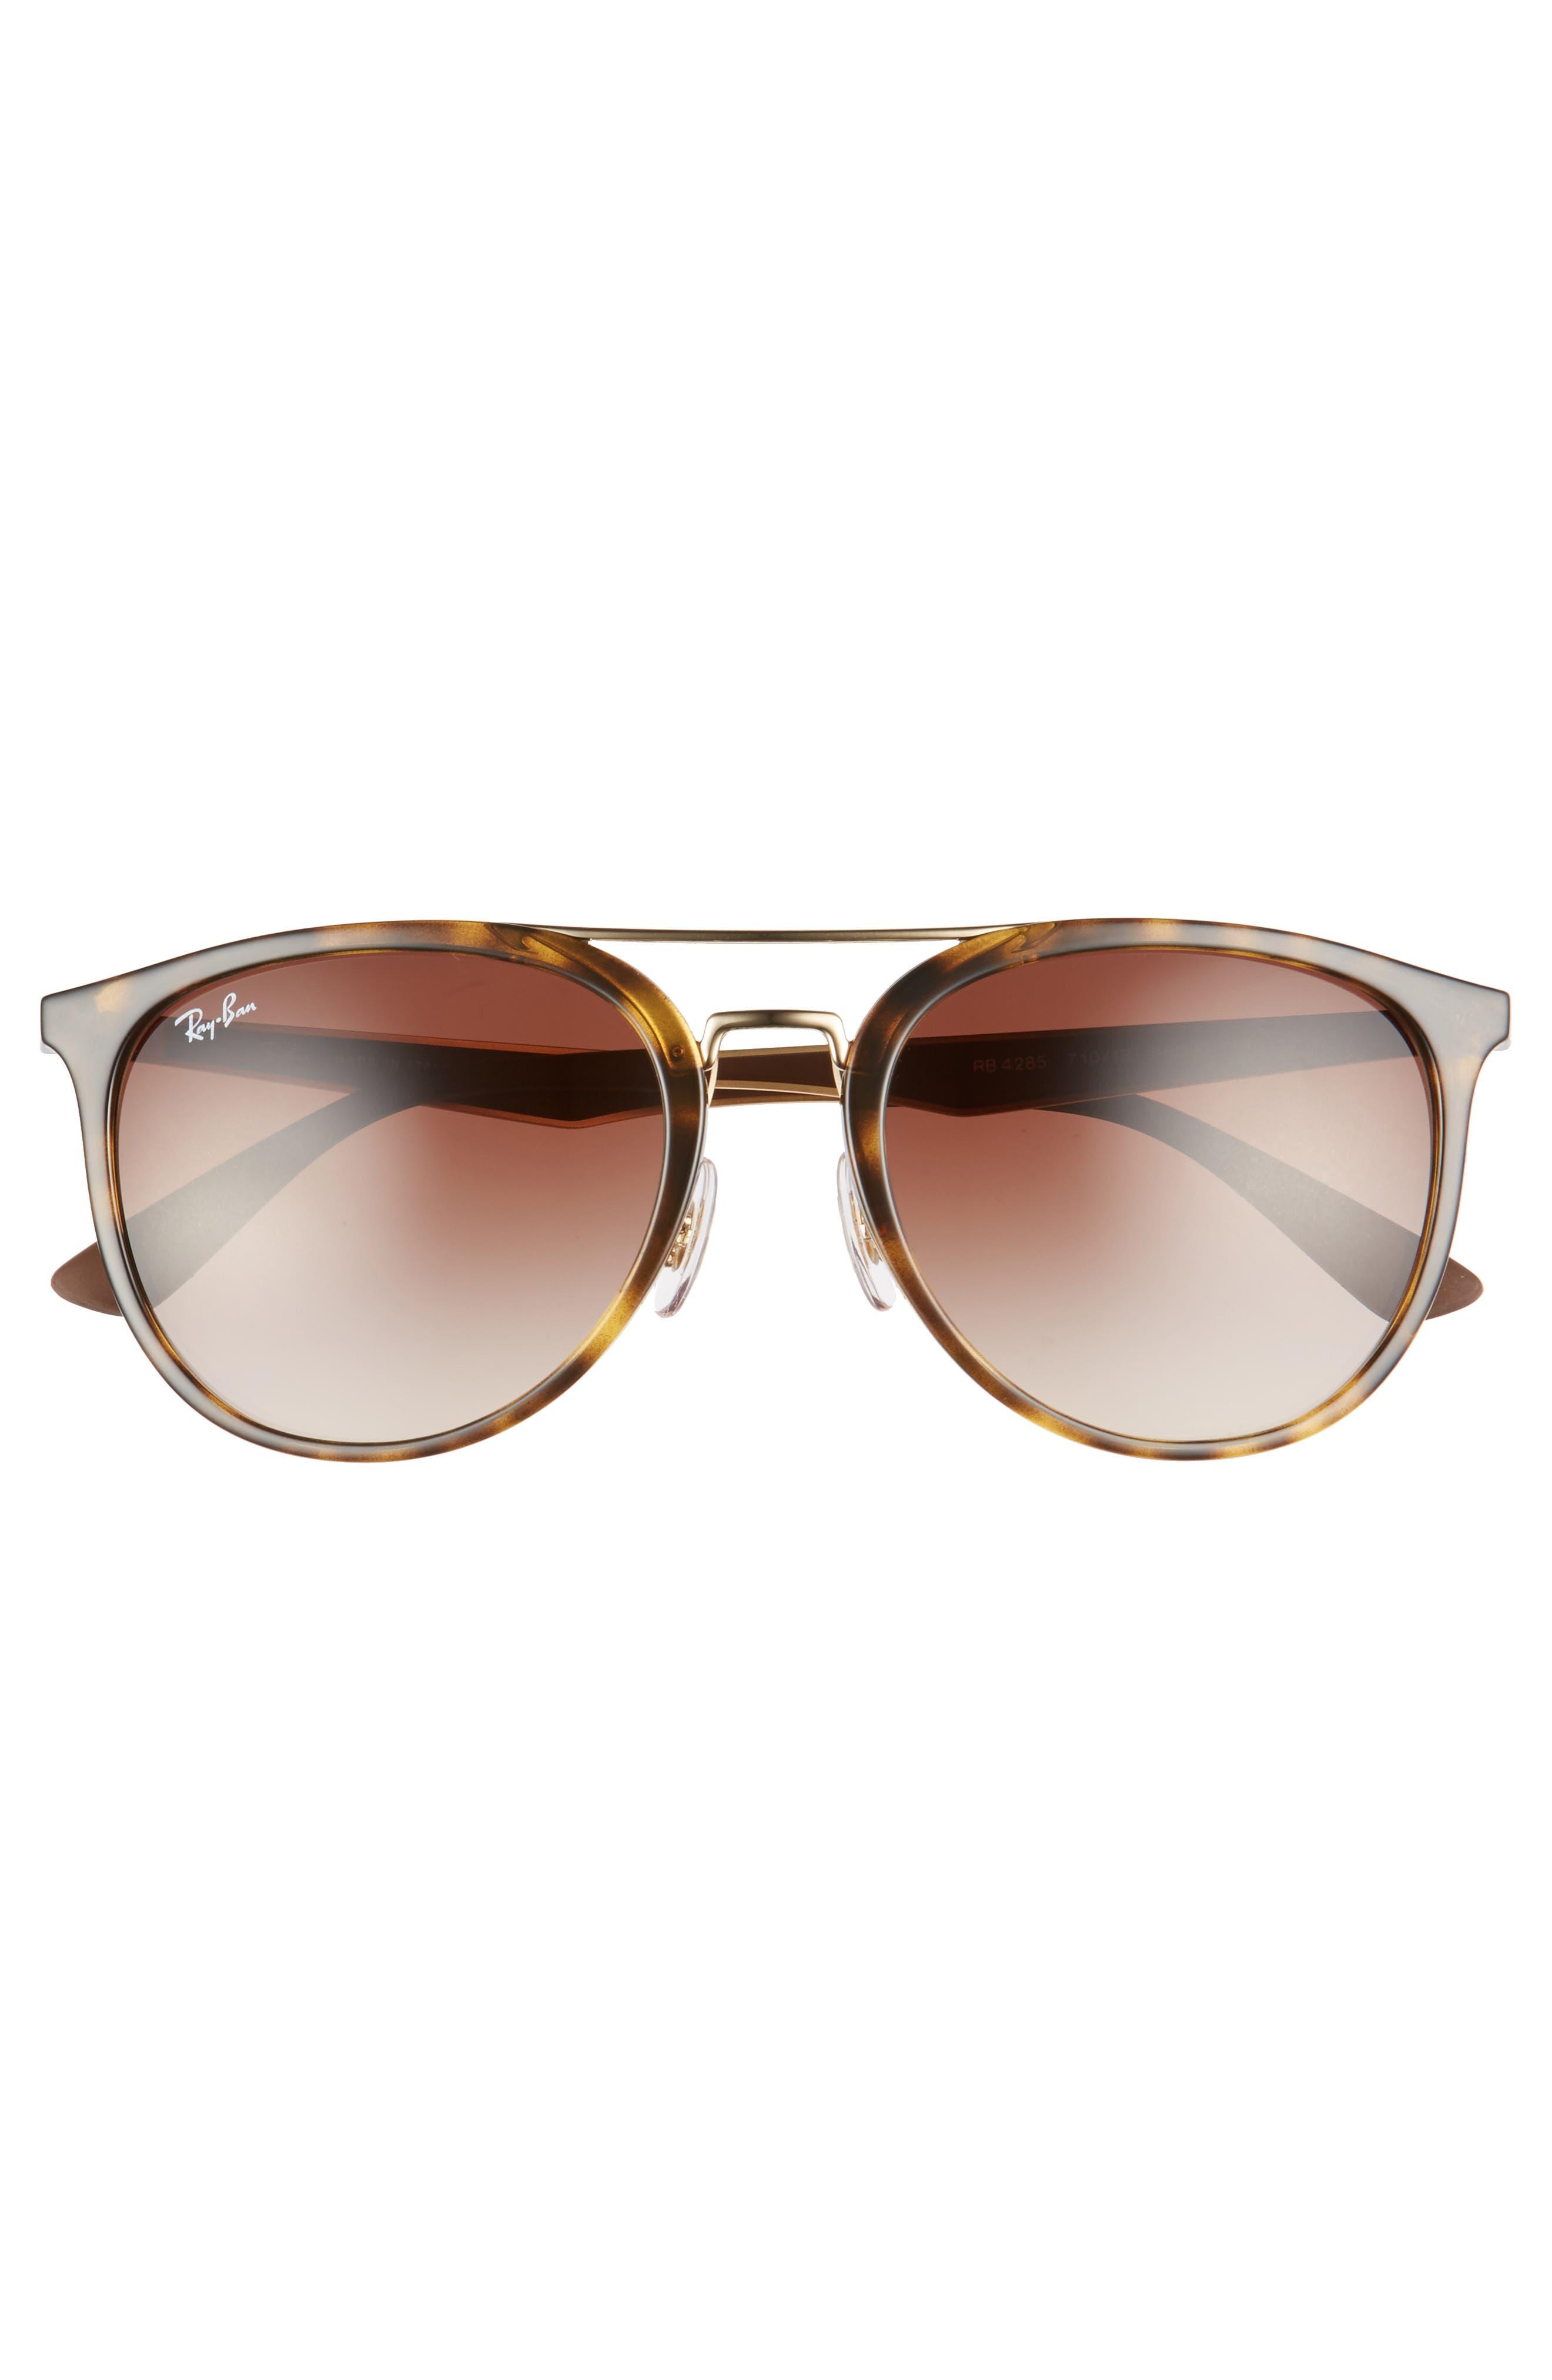 55mm Retro Sunglasses,                             Alternate thumbnail 2, color,                             Light Tortoise